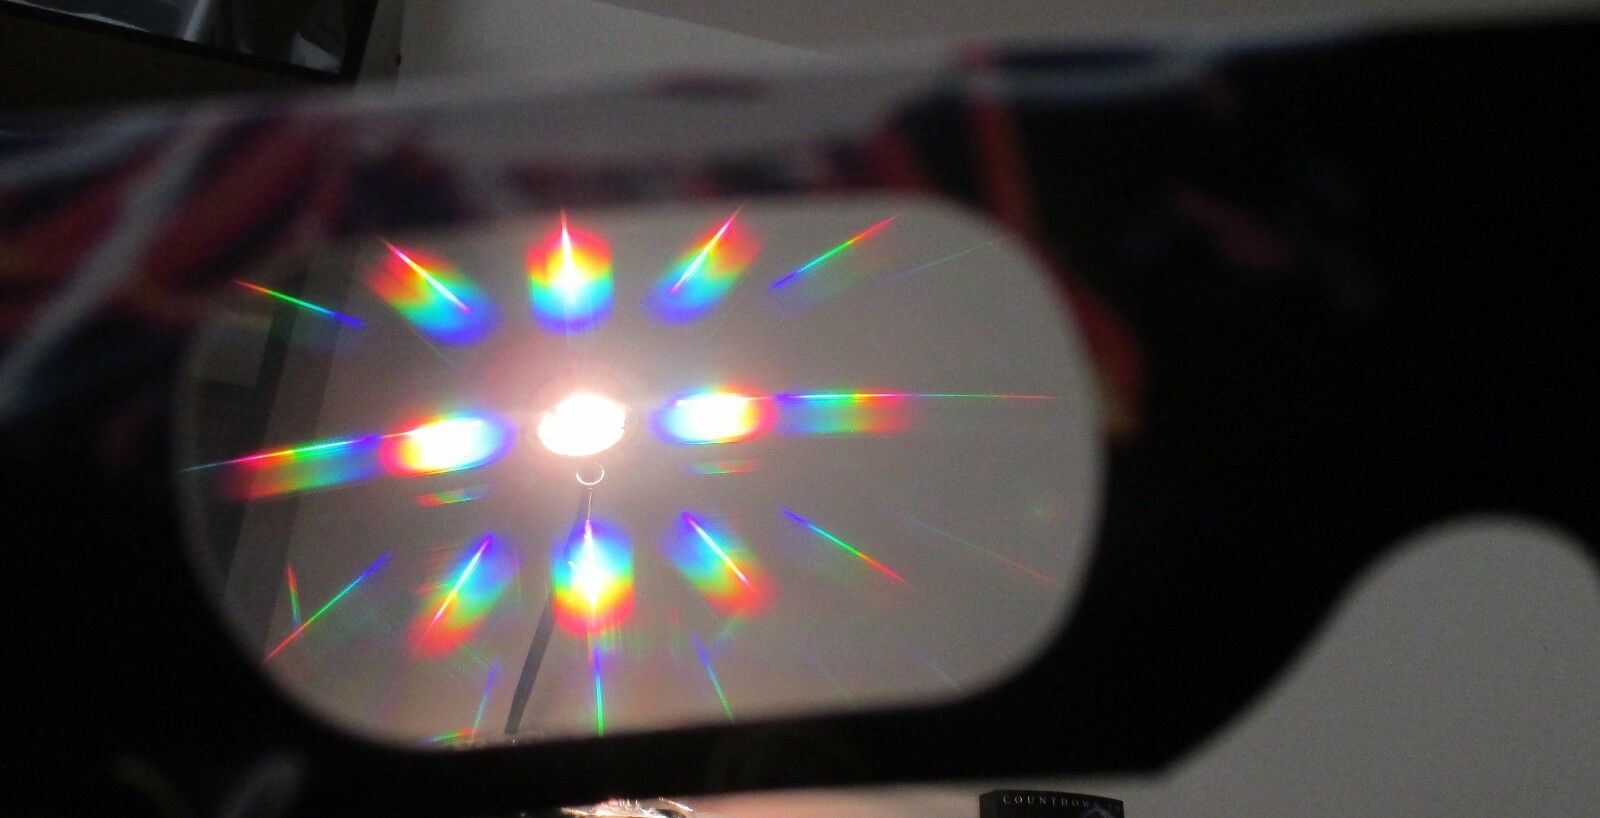 Fireworks Glasses - 100 Pair - Rainbow Spectrum Spectrum Spectrum Diffraction Glasses 64058f